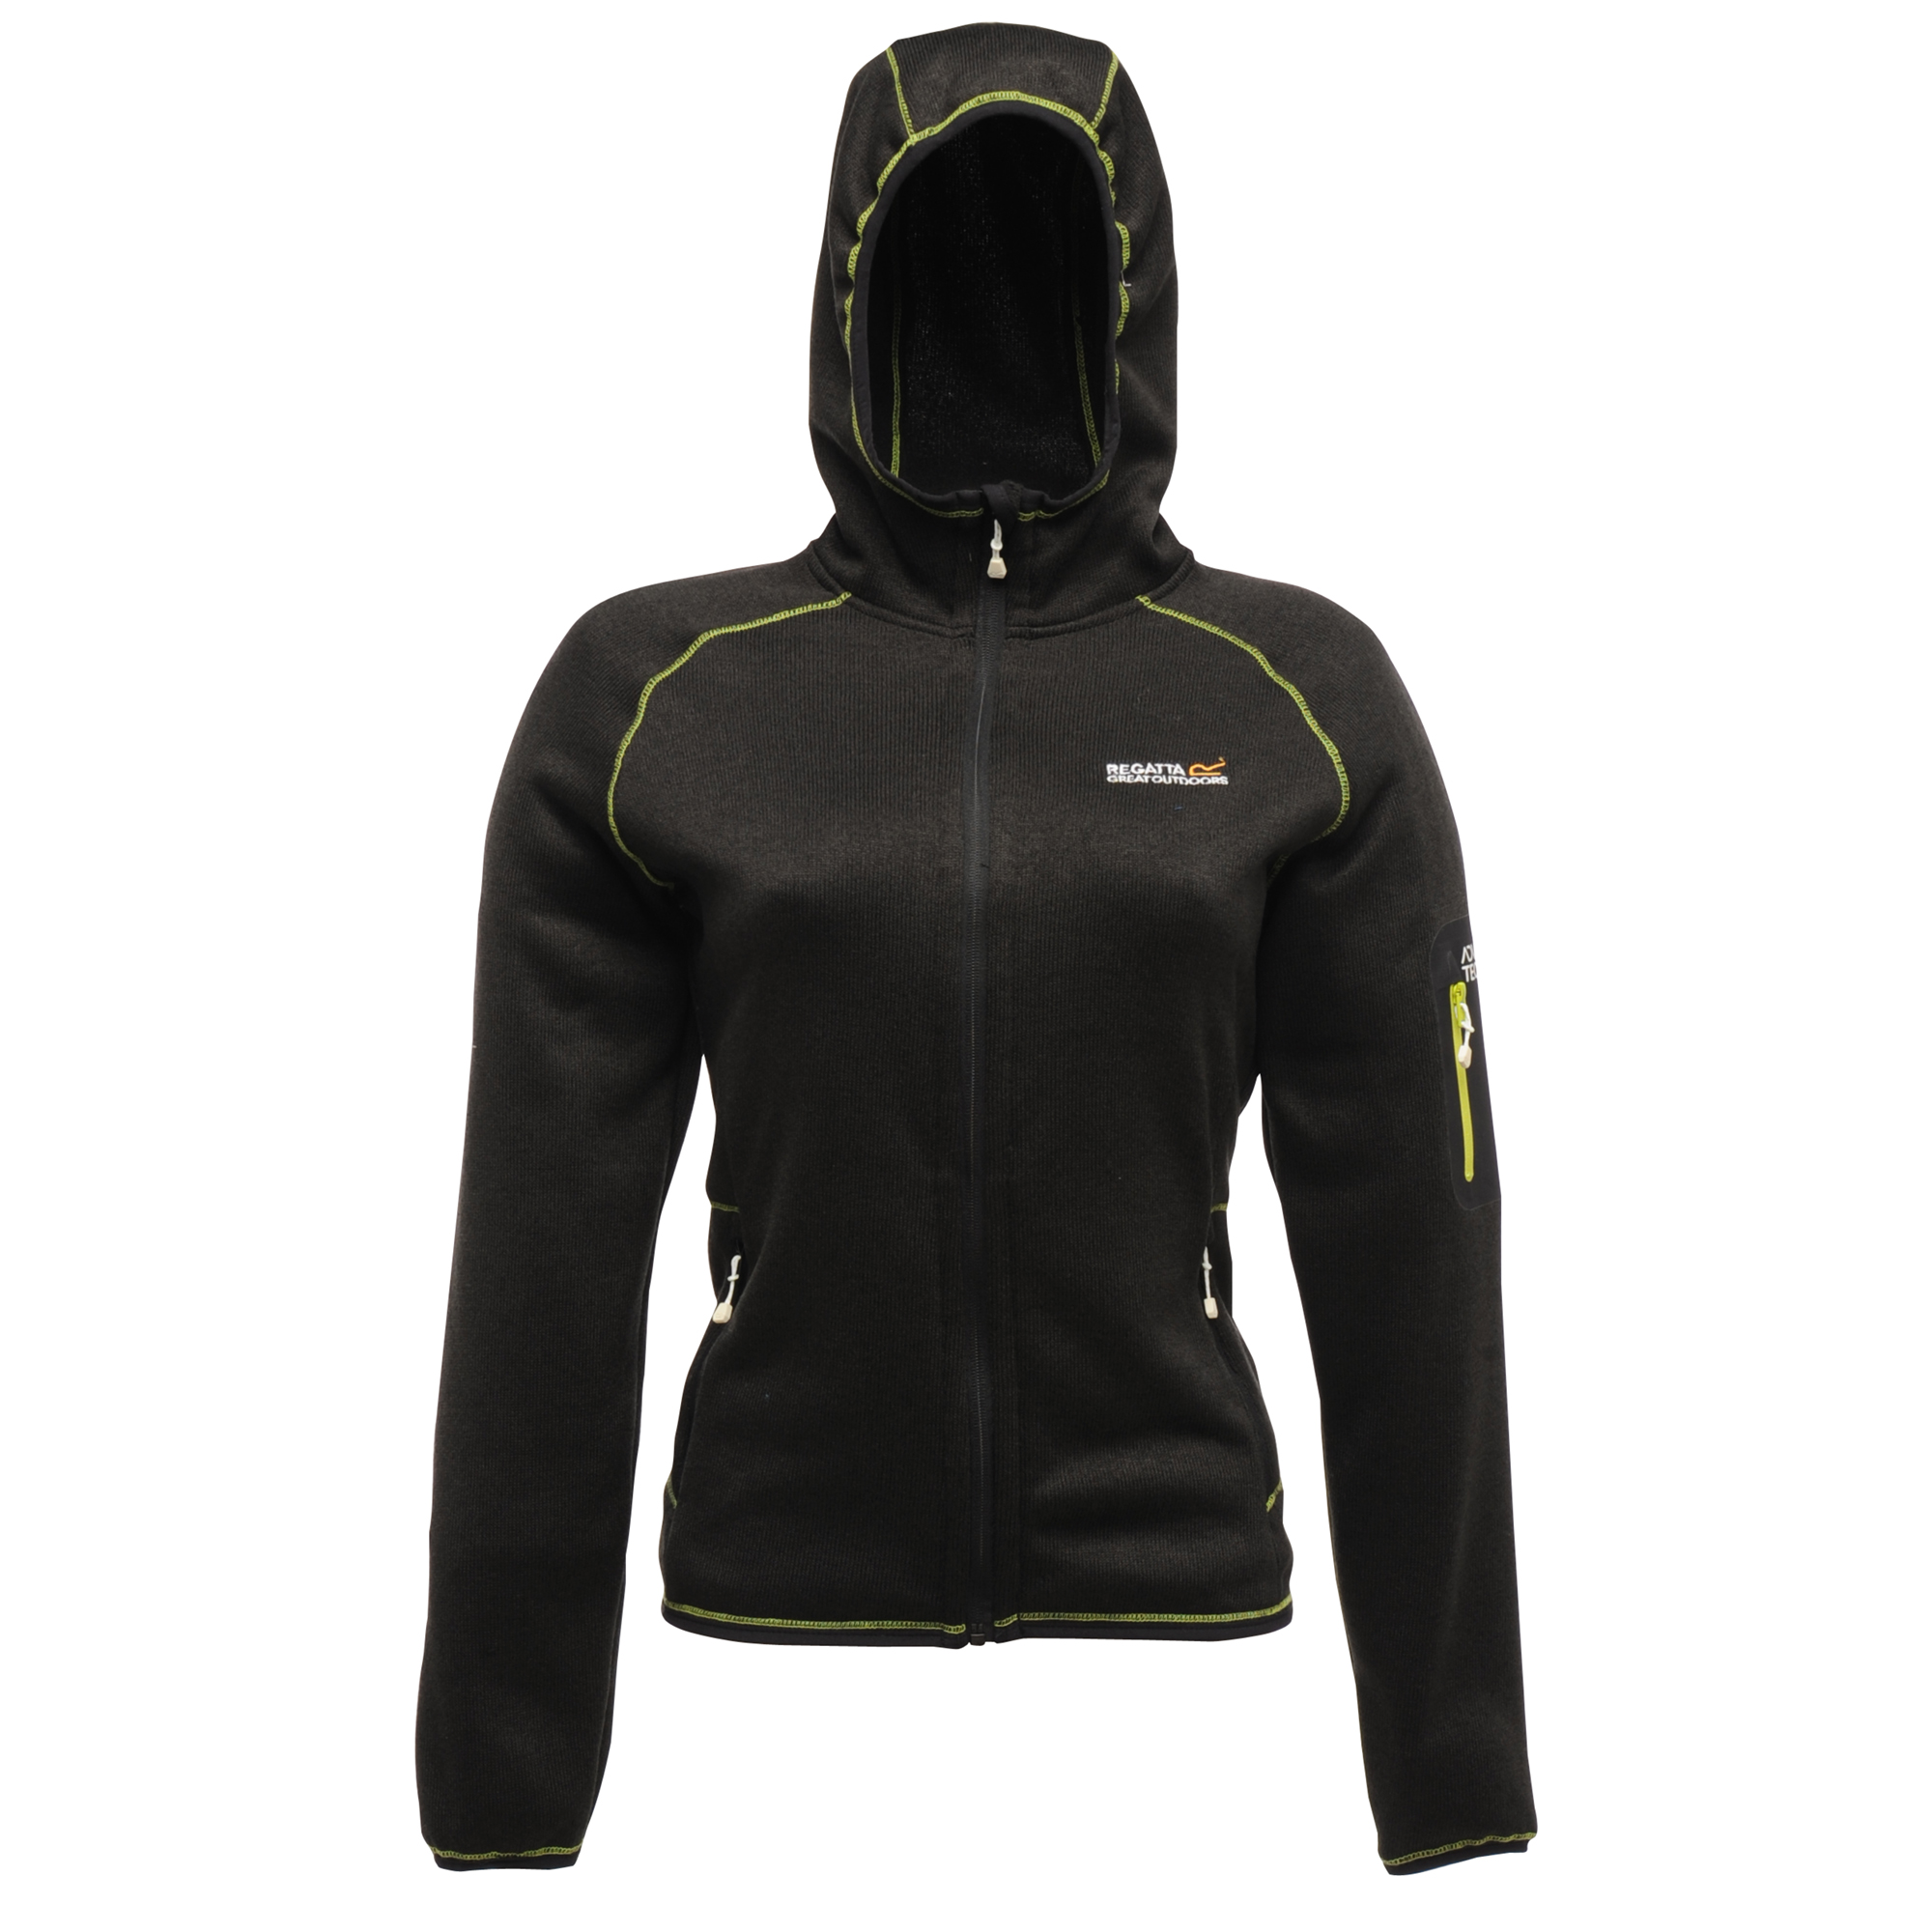 Regatta Winterlove sportliche Damen Fleecejacke Strickeffekt schwarz